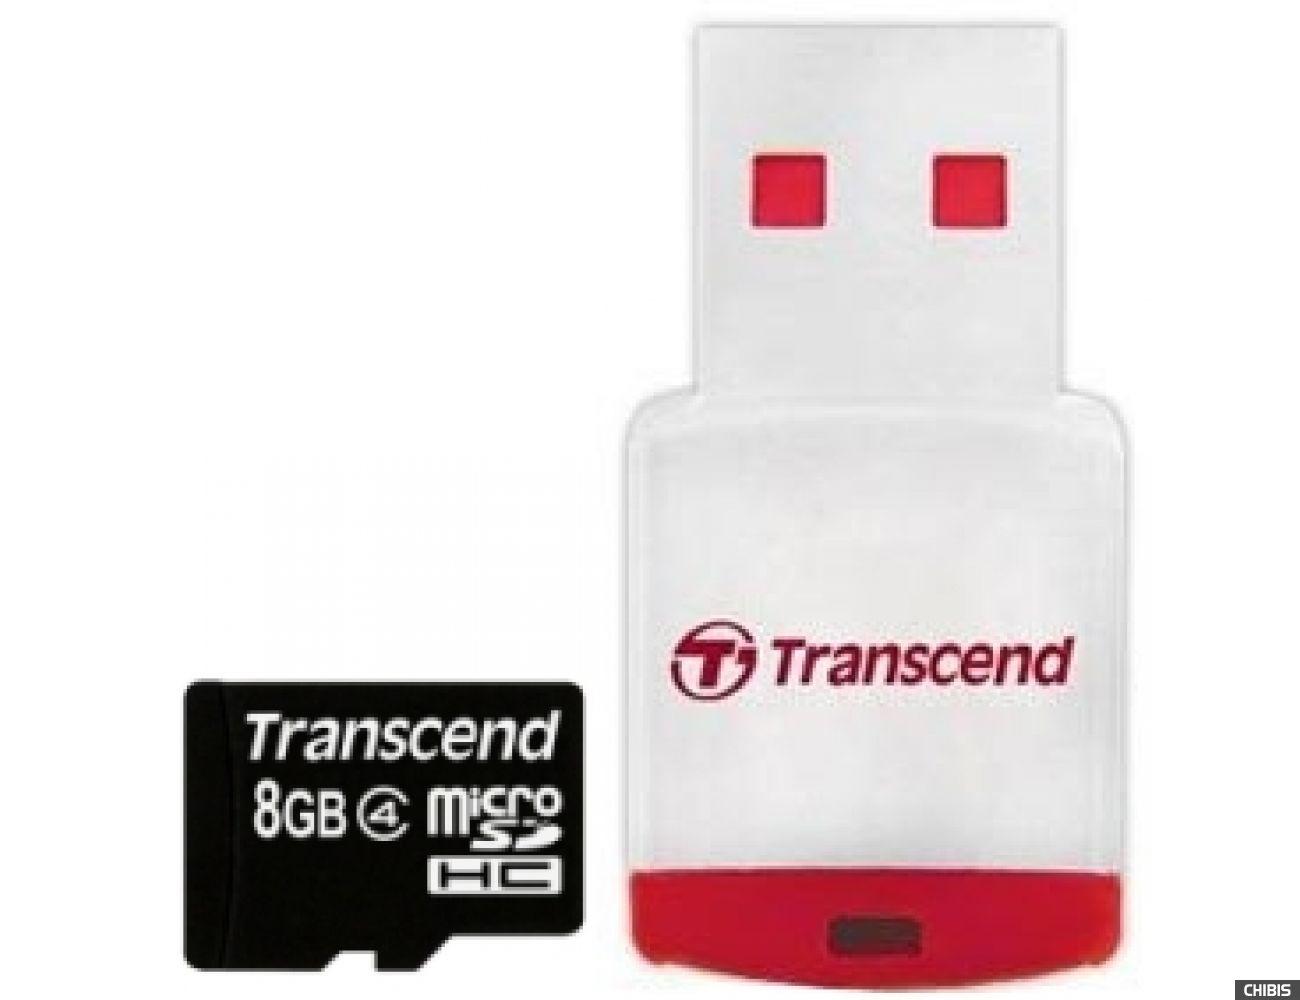 Карта памяти Transcend MicroSDHC 8GB (Class 4) + CardReader